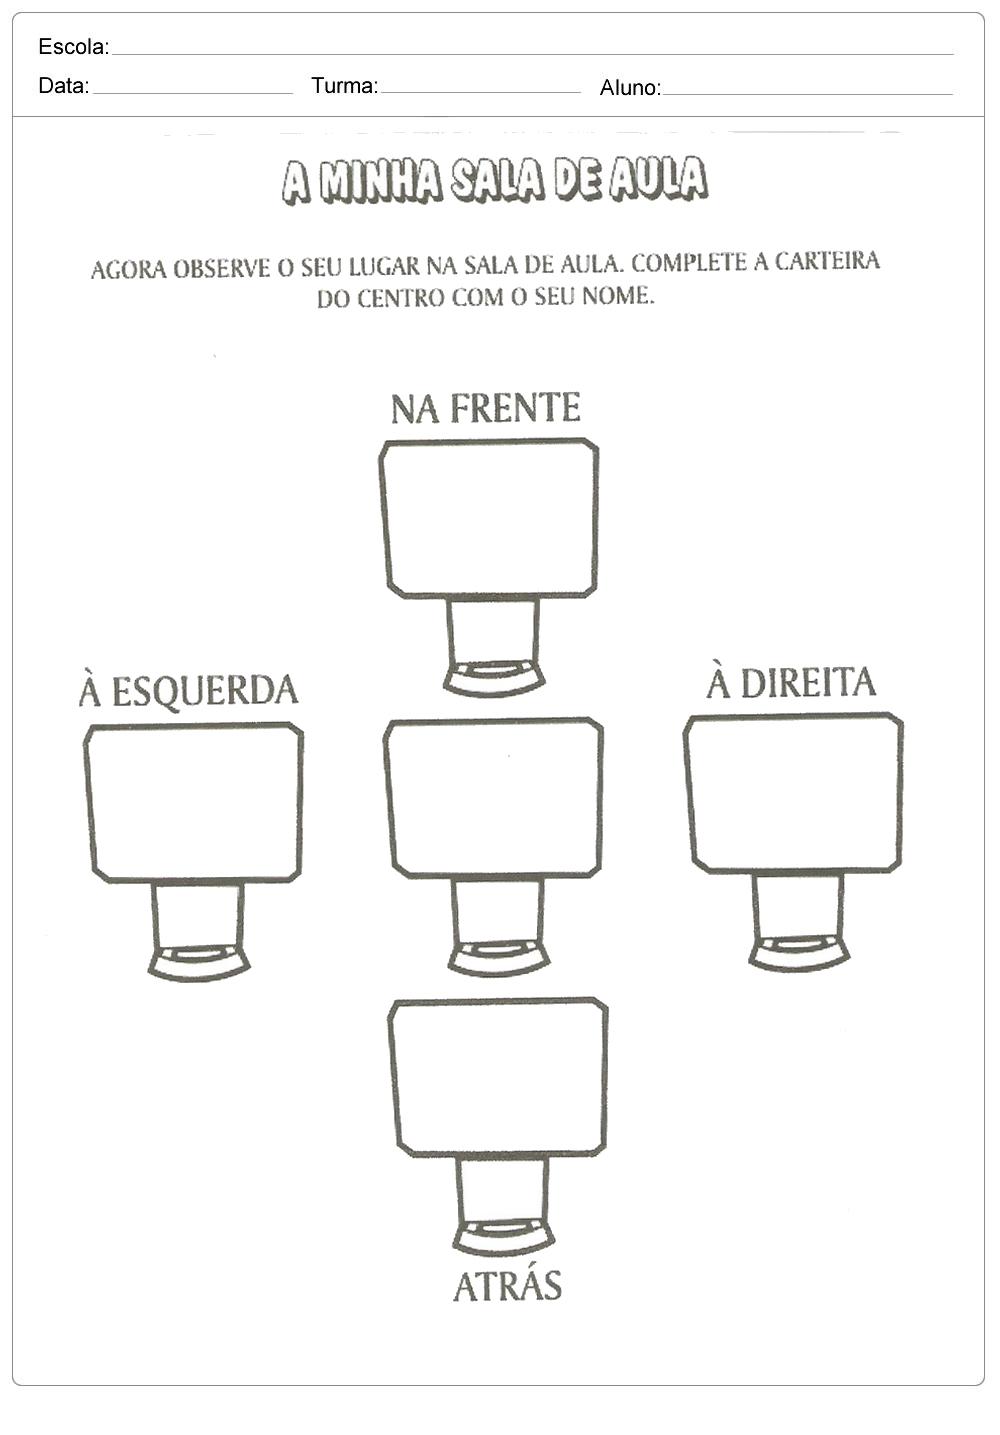 Atividades de Lateralidade: Direita e Esquerda prontas para imprimir